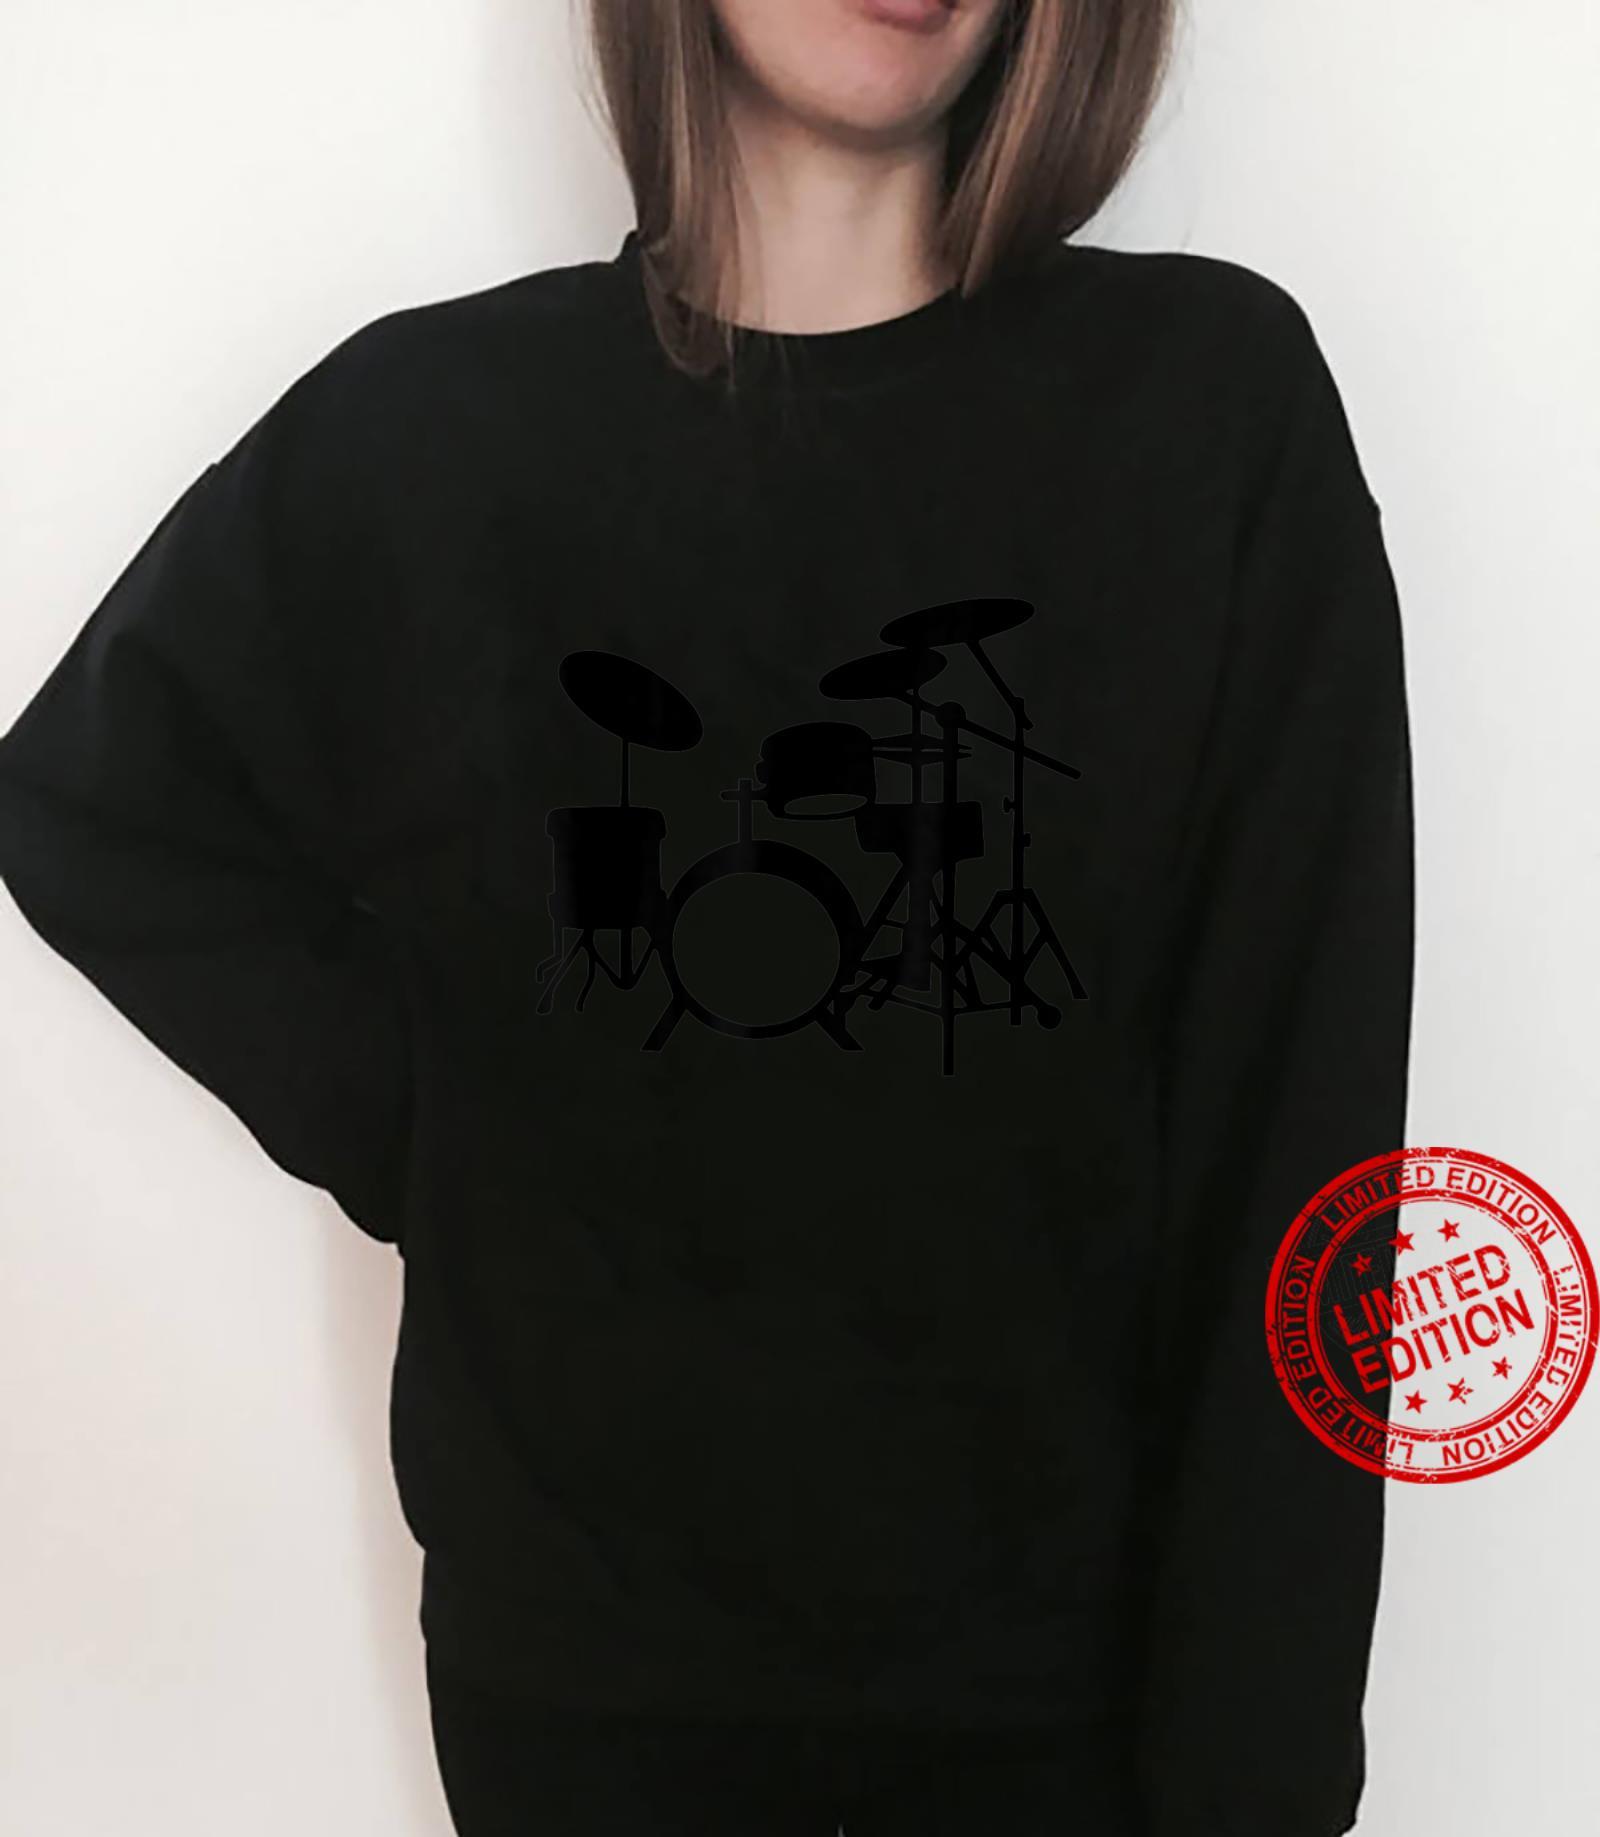 Vintage Drum Set Drummers Design Shirt sweater